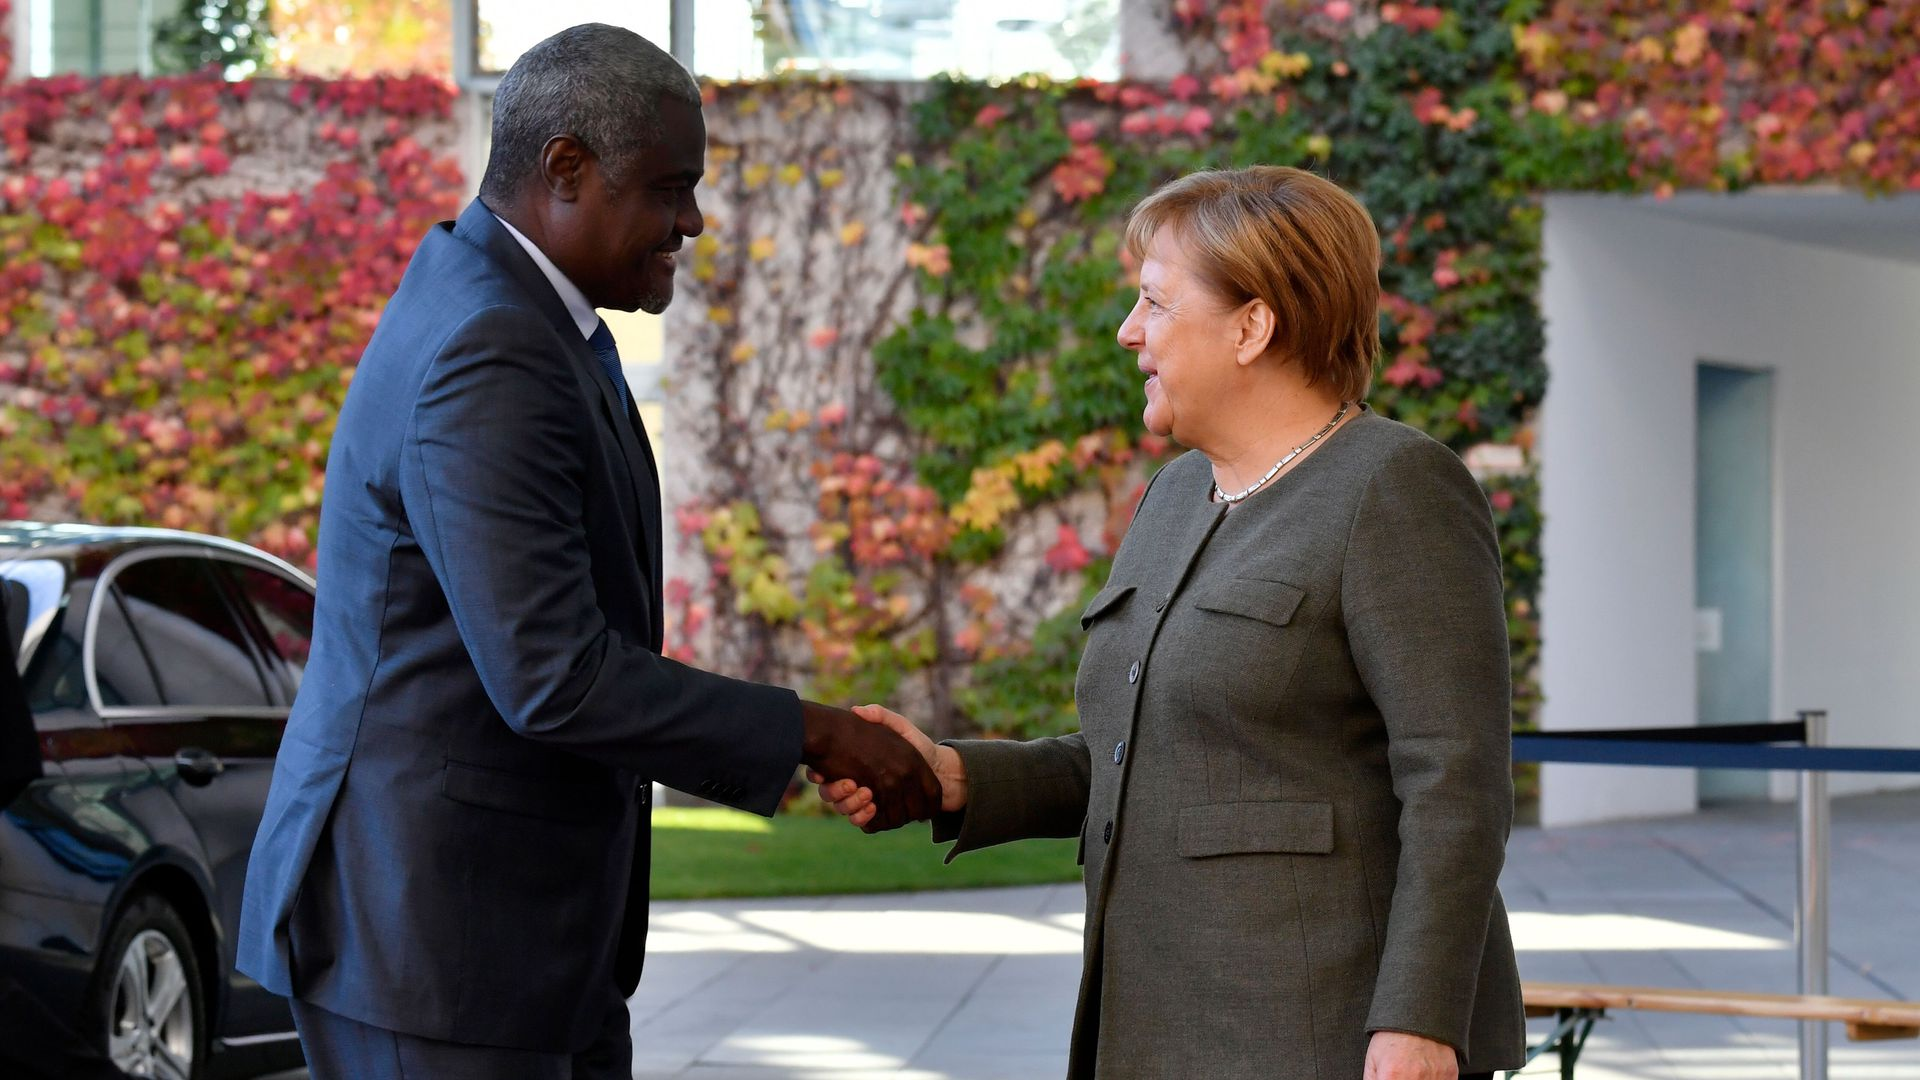 German Chancellor Angela Merkel welcomes African Union (AU) Commission Chairman, Moussa Faki